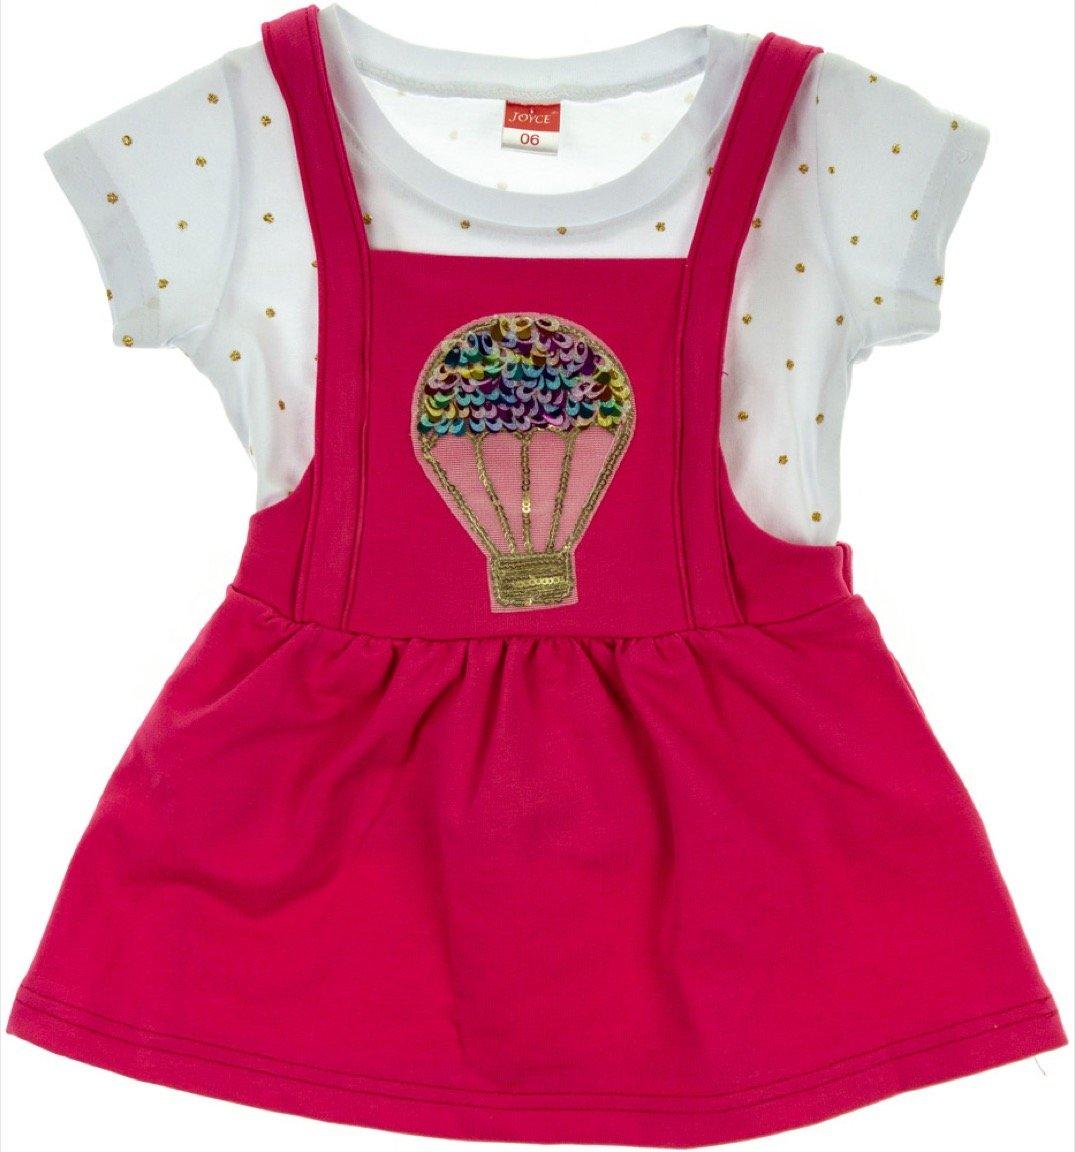 Joyce παιδικό σετ μπλούζα-φούστα σαλοπέτα «Aerostat»